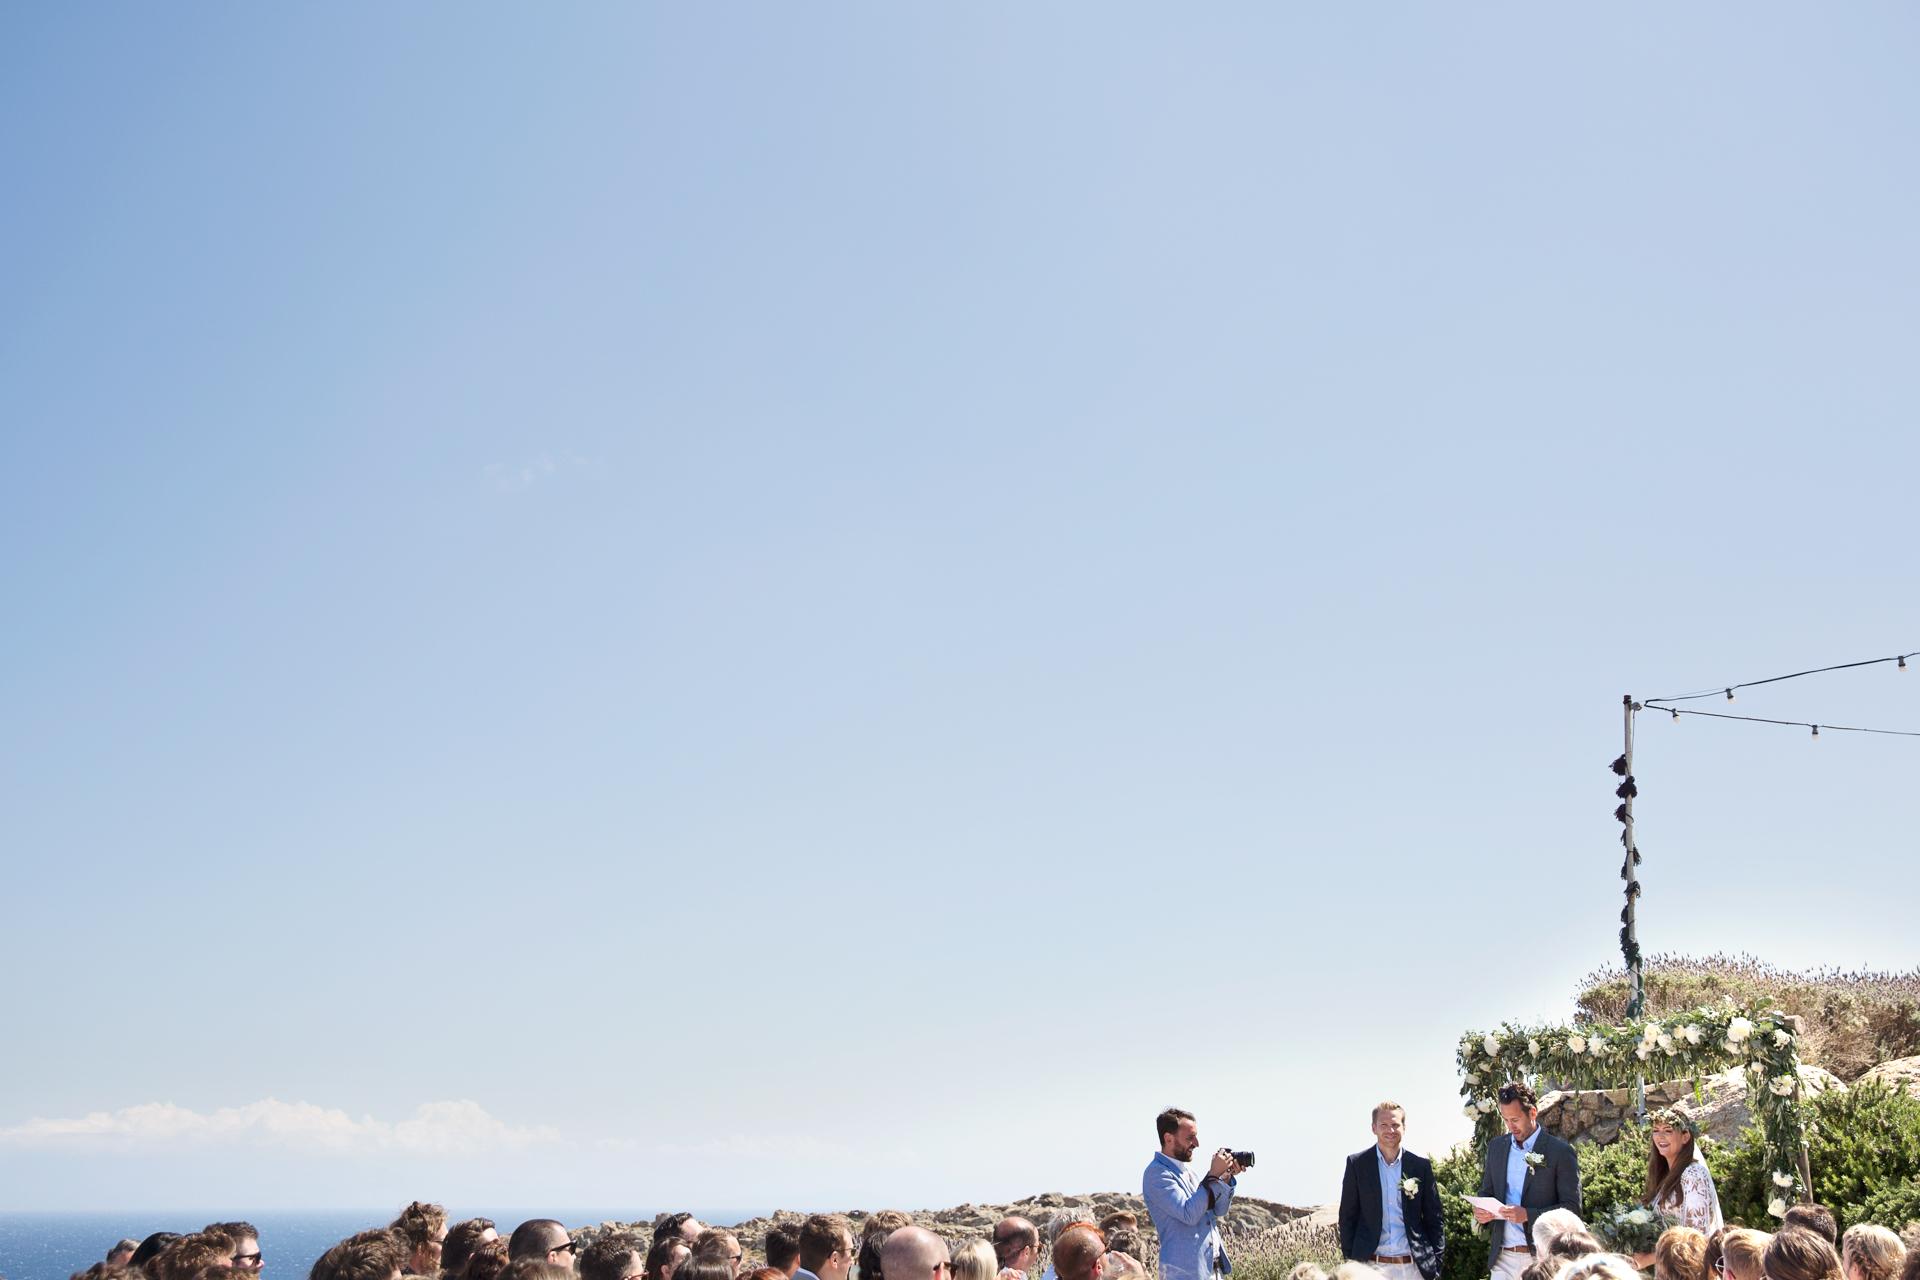 mykonos cliff top wedding by the sea